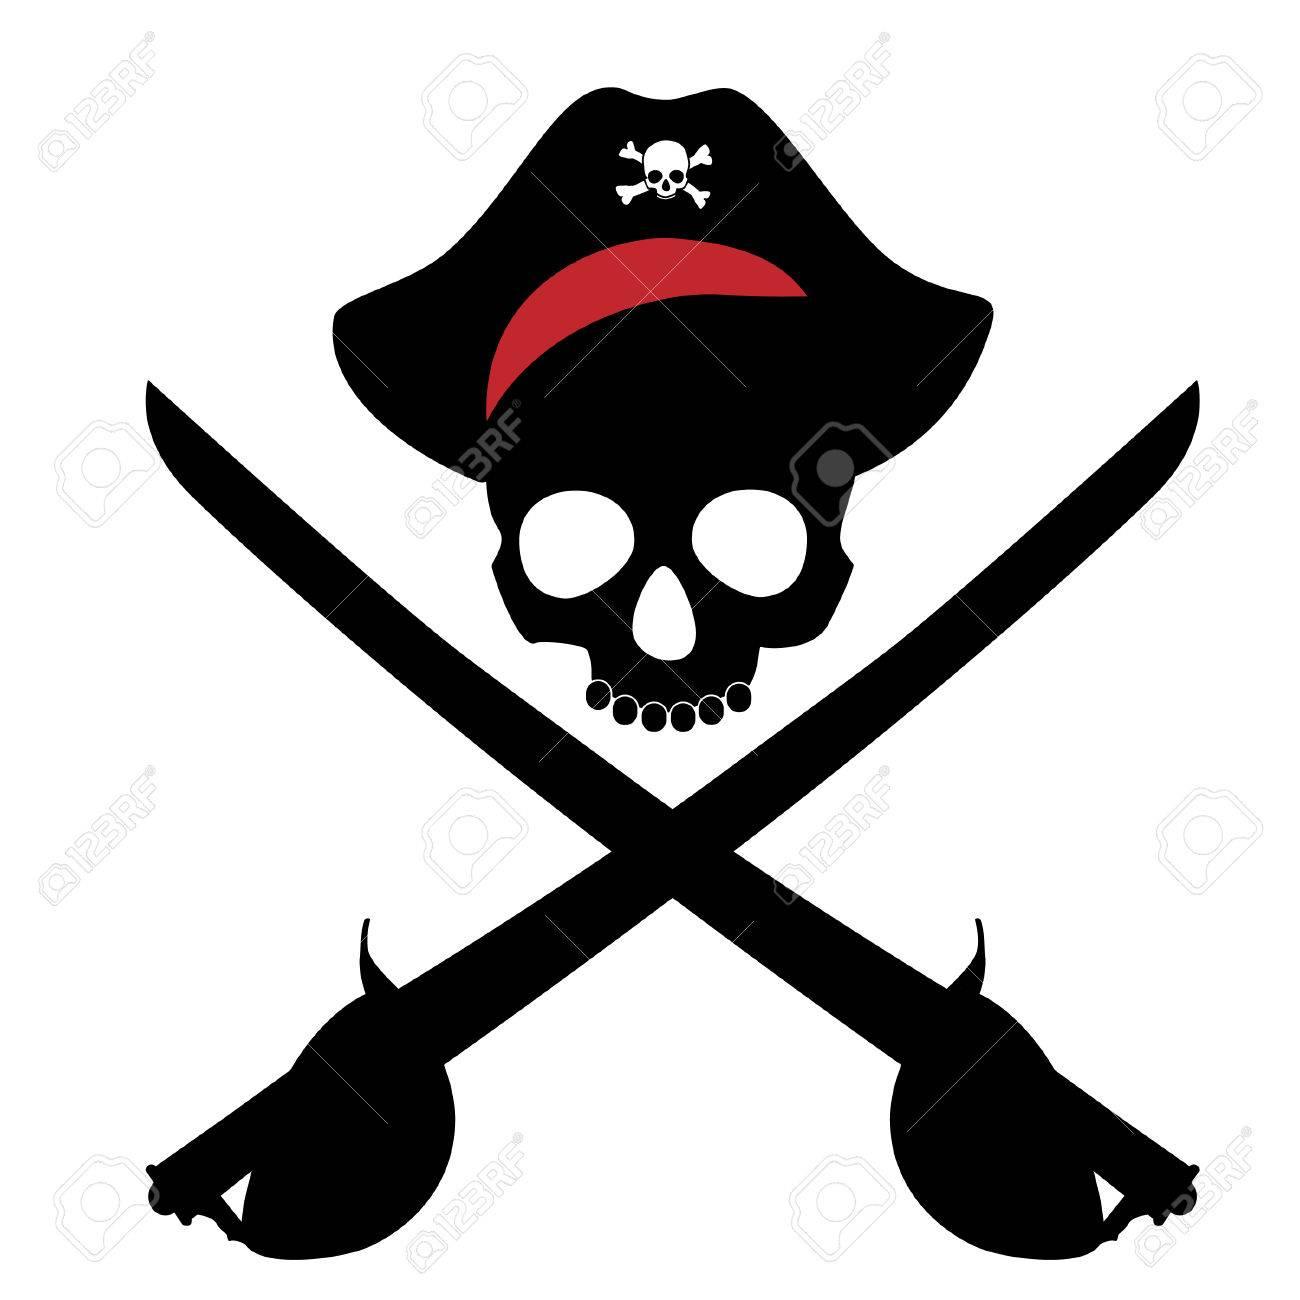 Pirate Skull In Bandana And Two Crossed Sword Cutlass Vector Stock